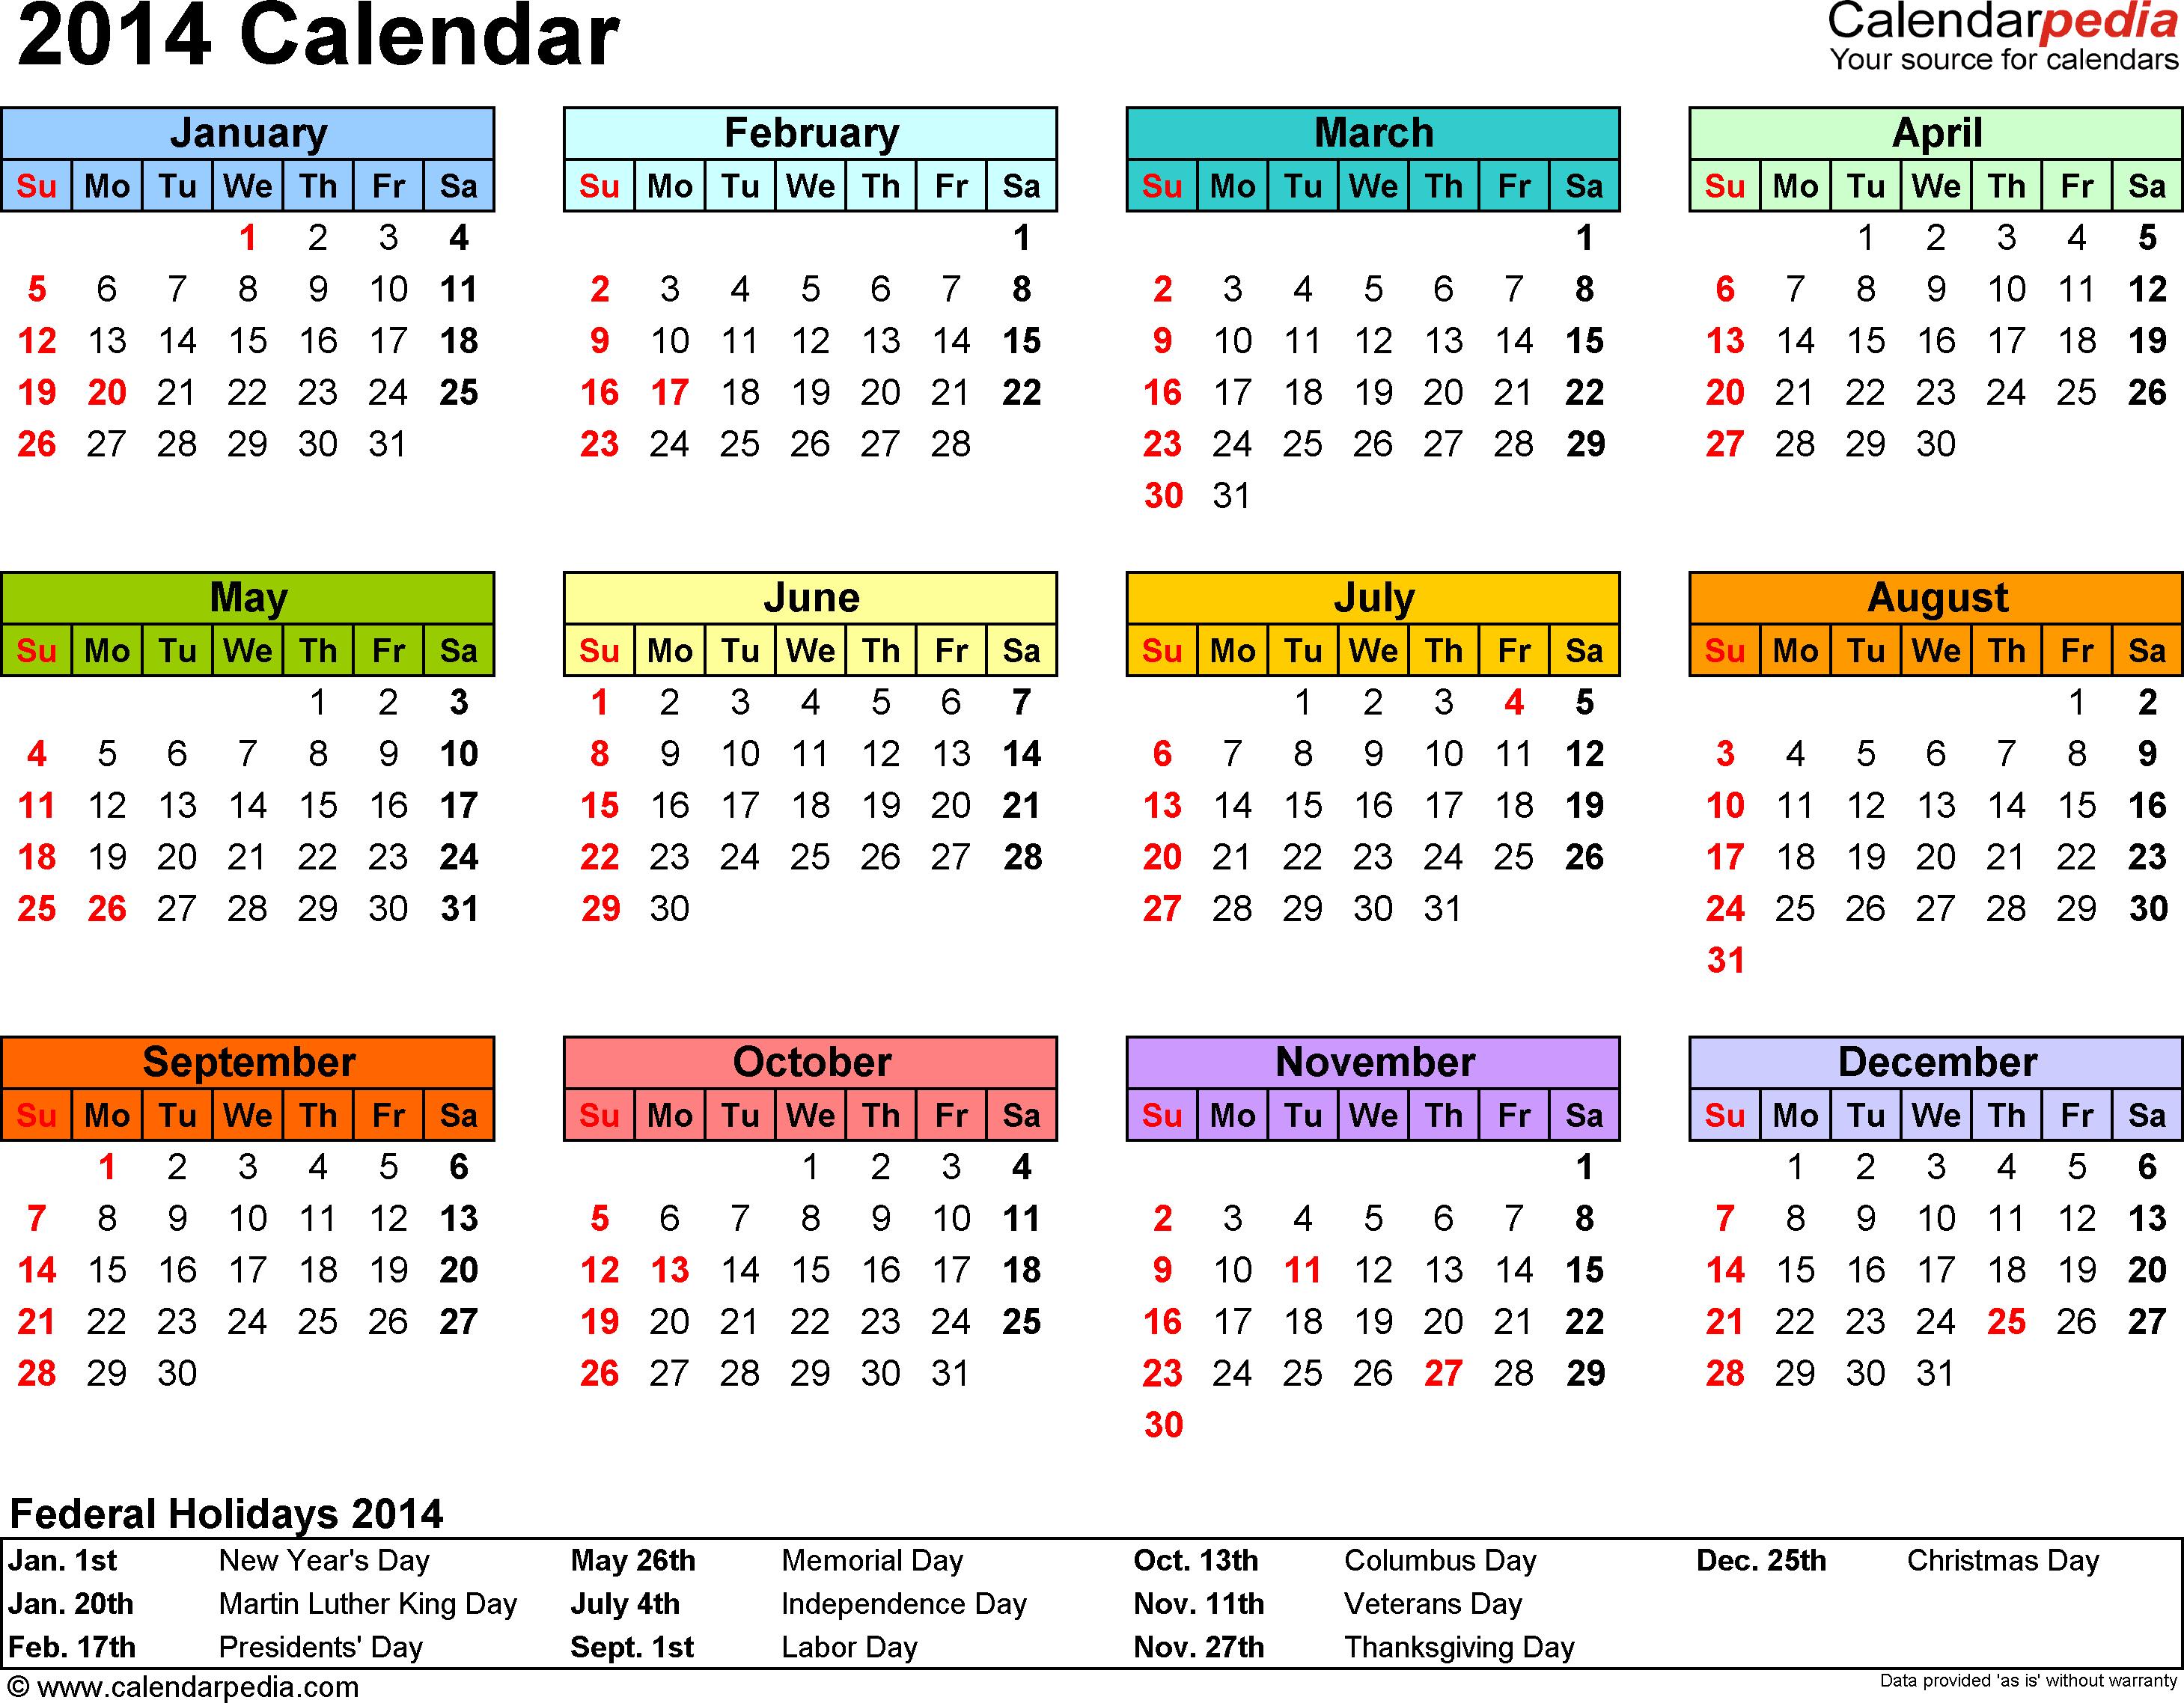 17 2014 Calendar Template Images